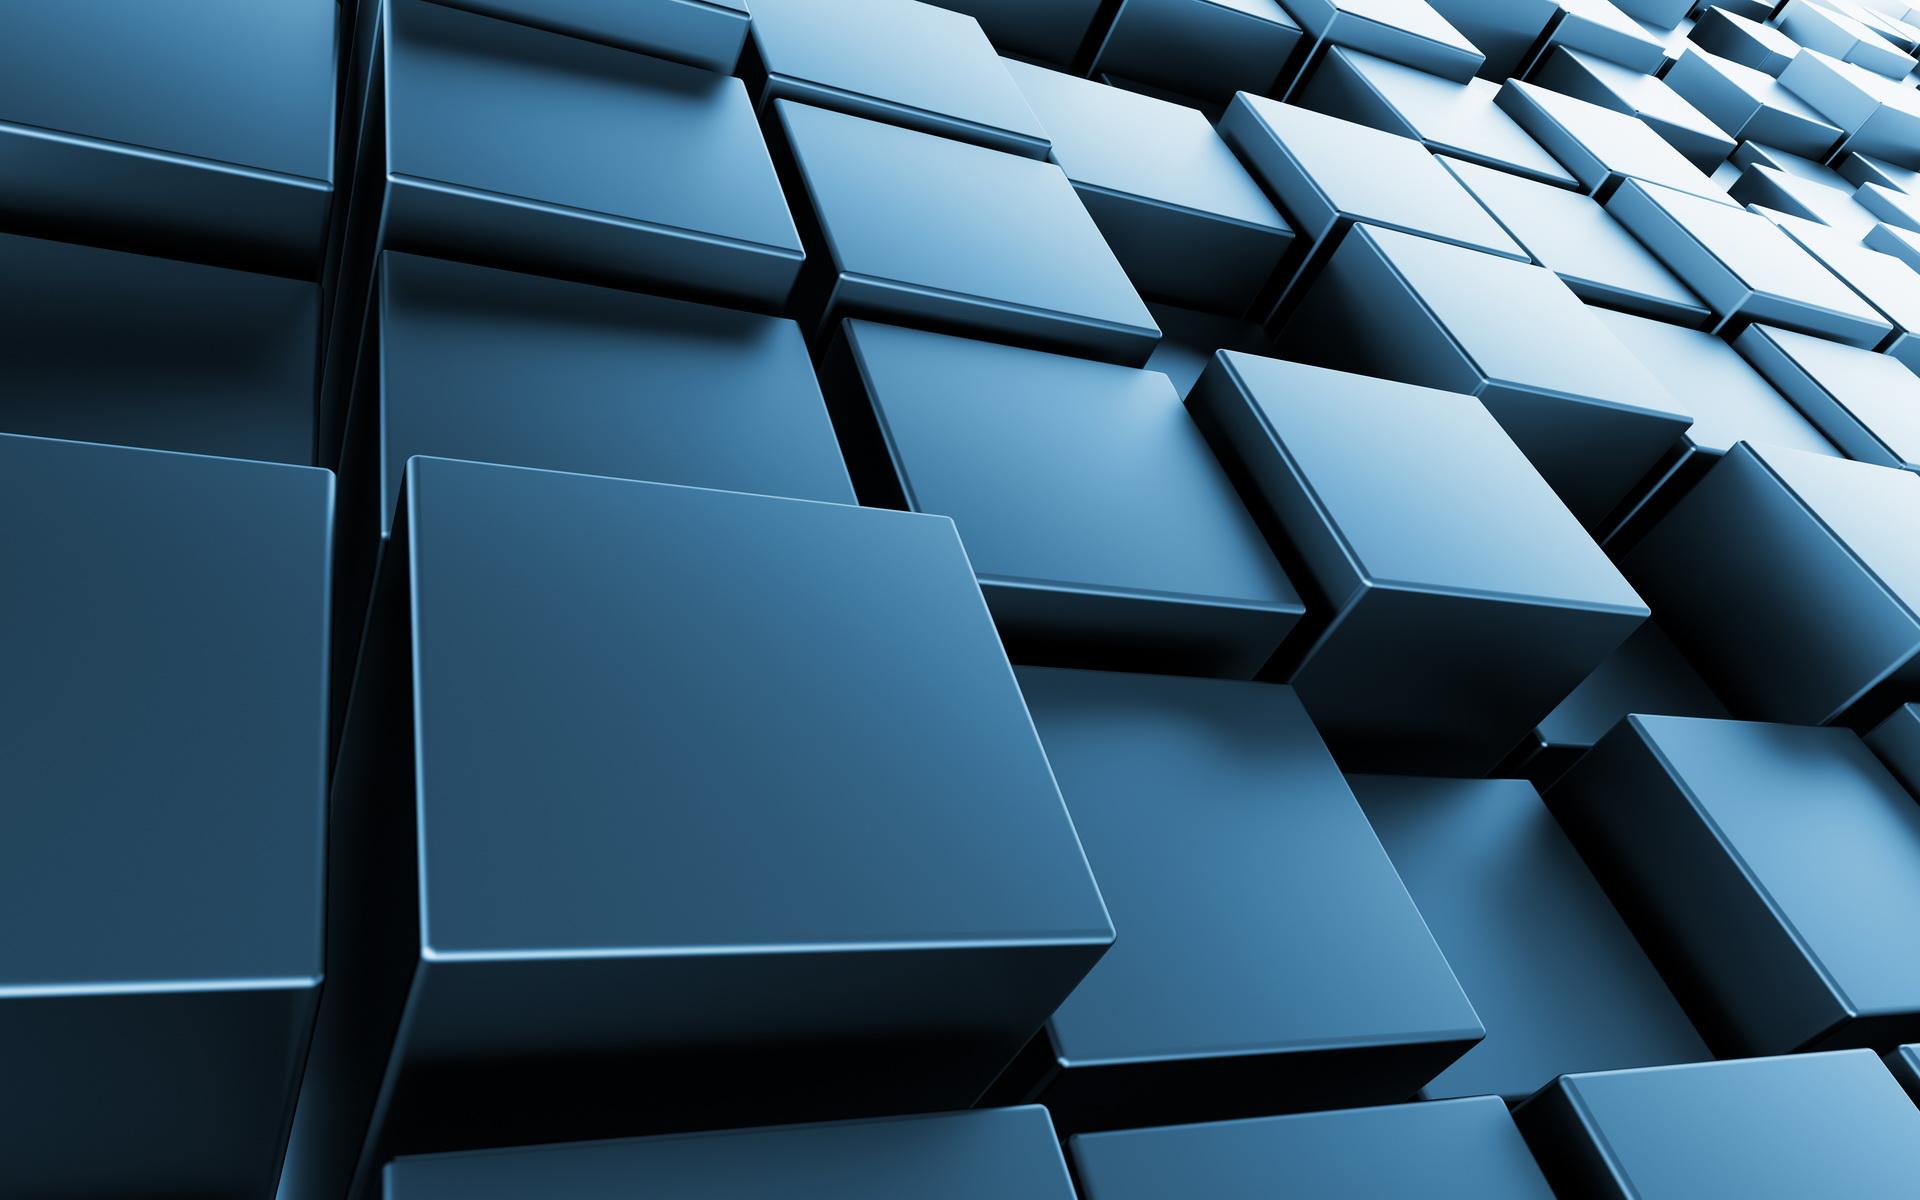 cube computer wallpapers desktop - photo #10